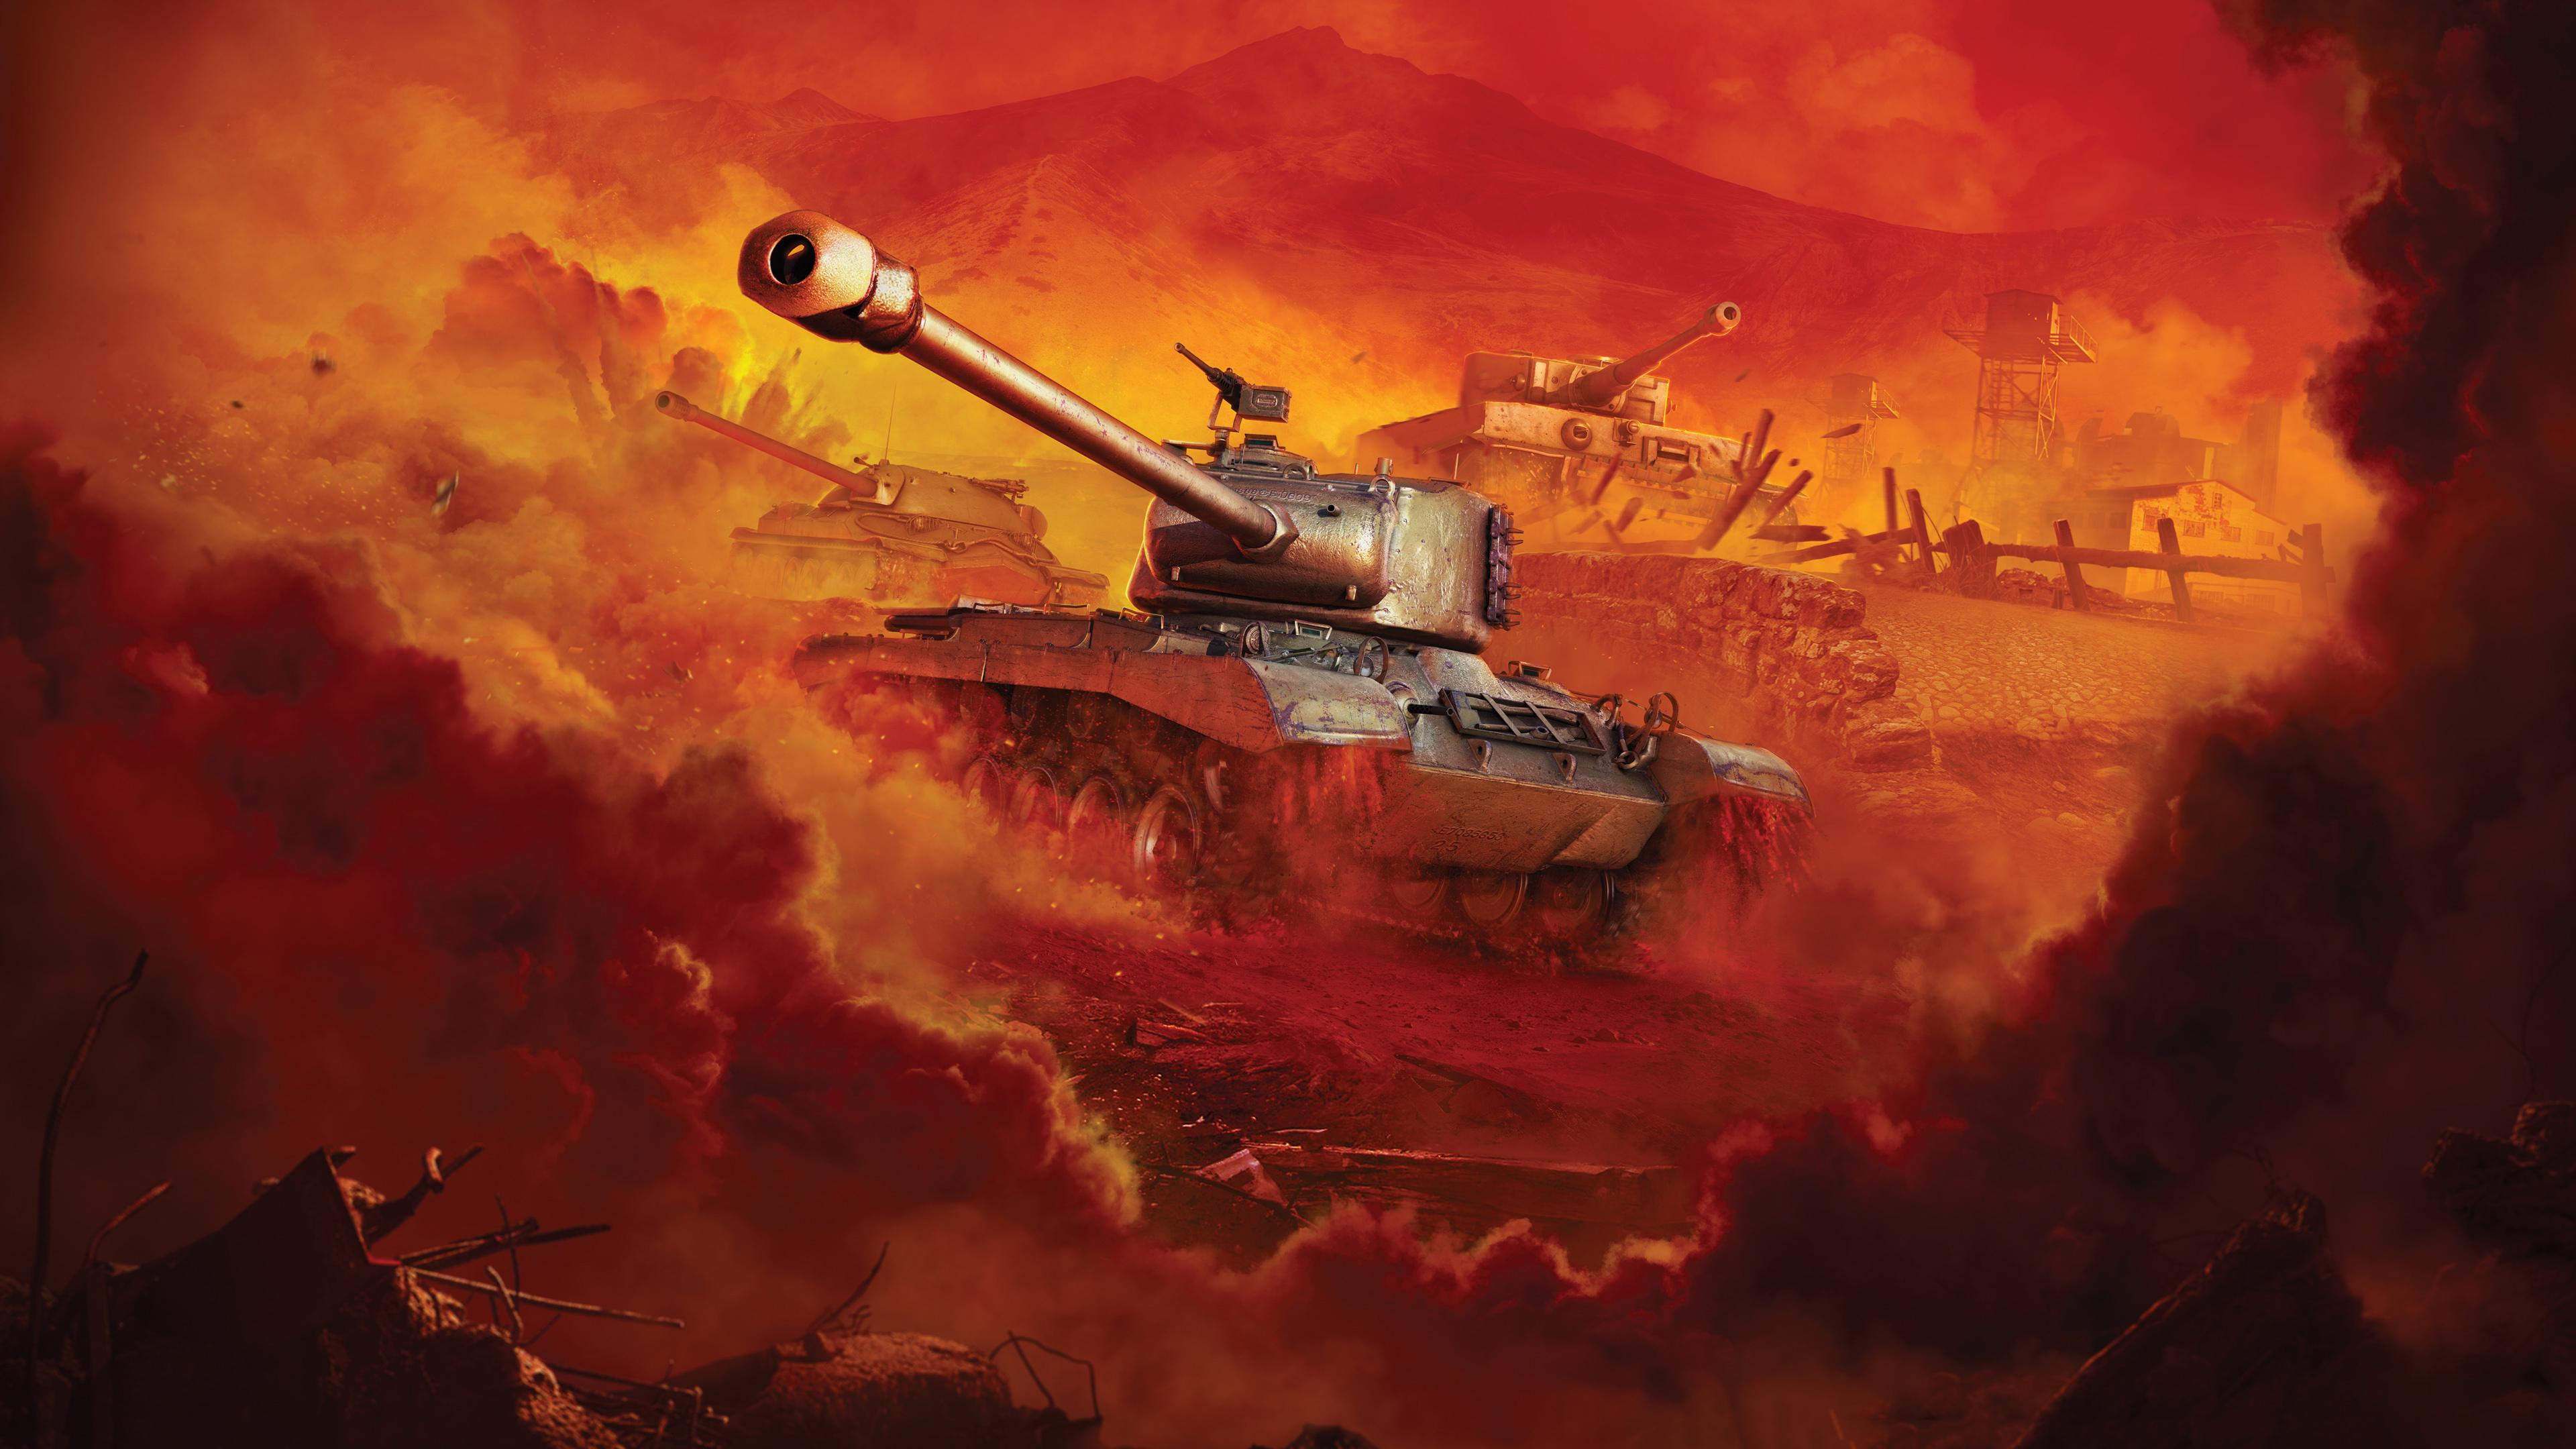 world of tanks game 4k 1539791930 - World Of Tanks Game 4k - xbox games wallpapers, world of tanks wallpapers, tank wallpapers, ps4 games wallpapers, pc games wallpapers, hd-wallpapers, games wallpapers, 4k-wallpapers